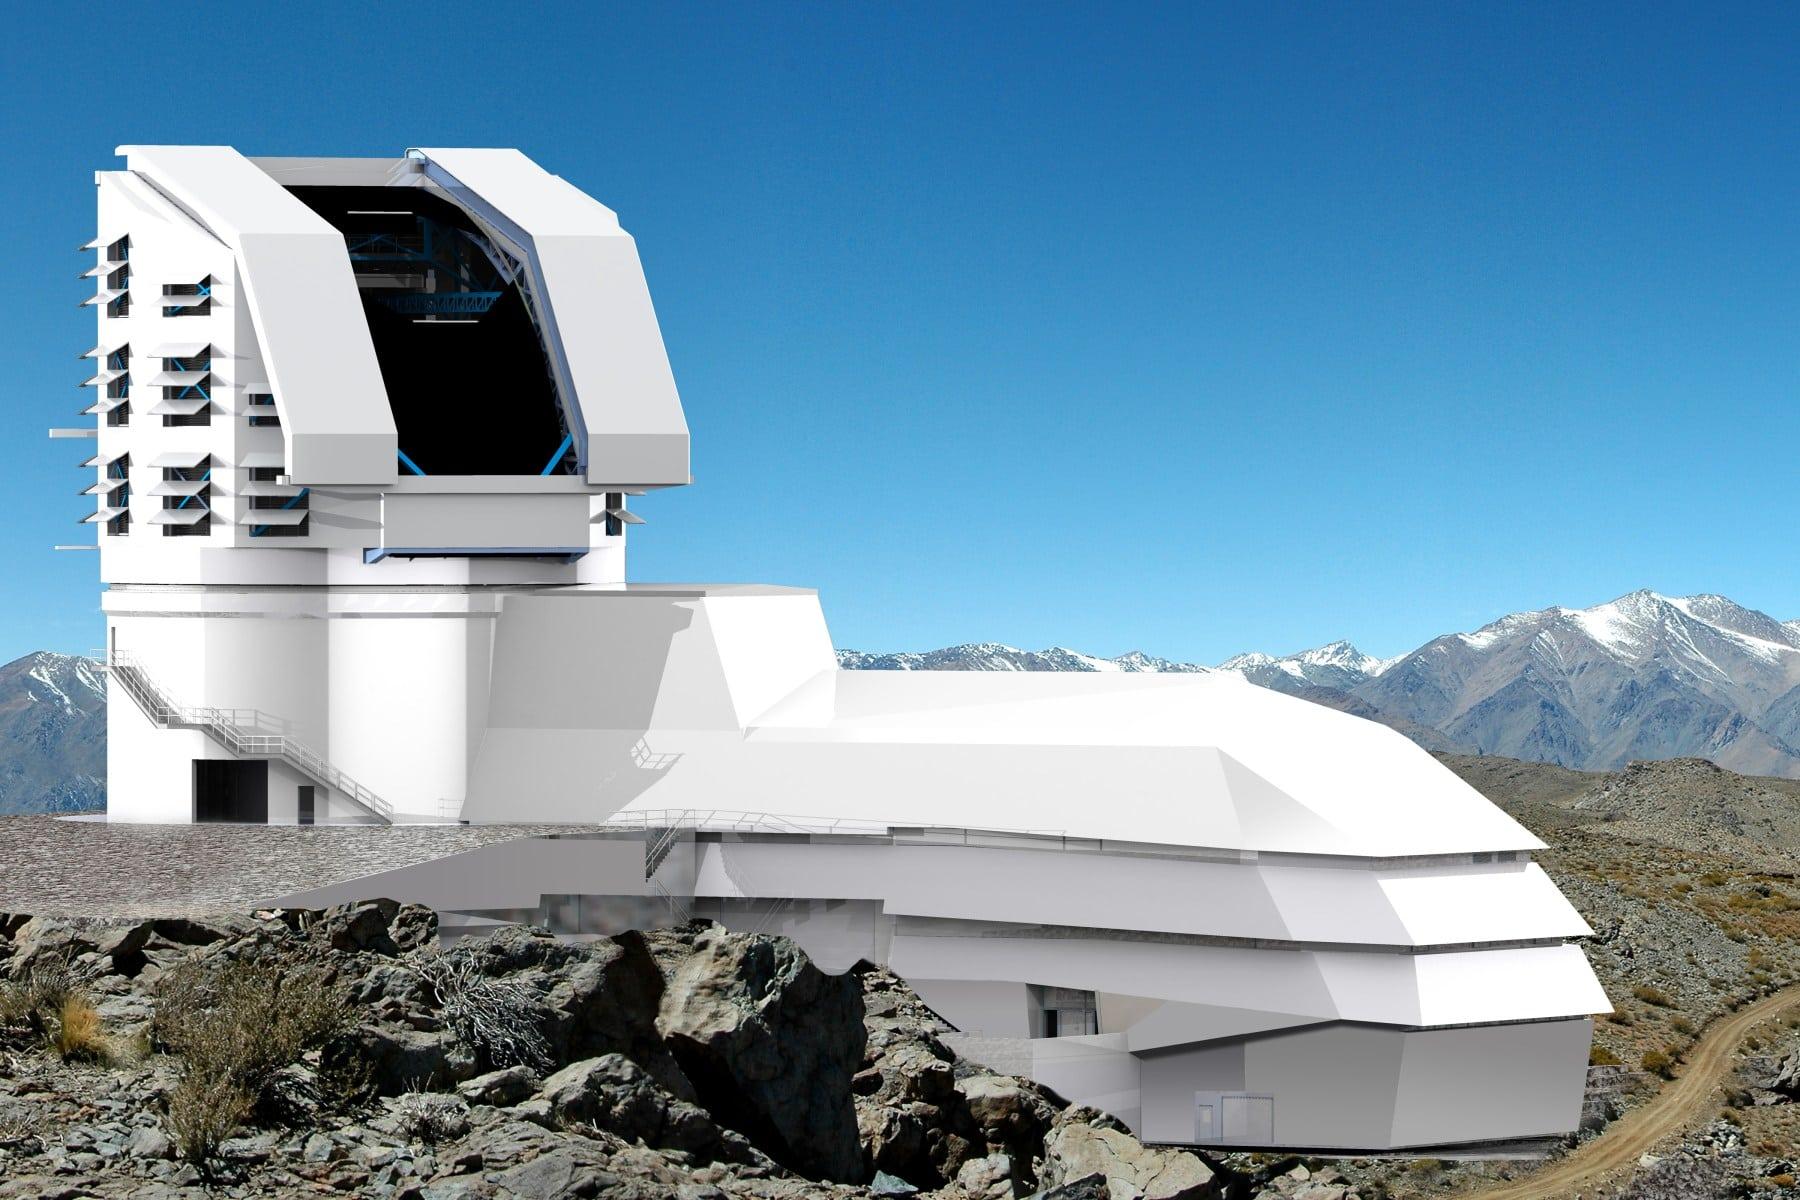 Vera C. Rubin Observatory